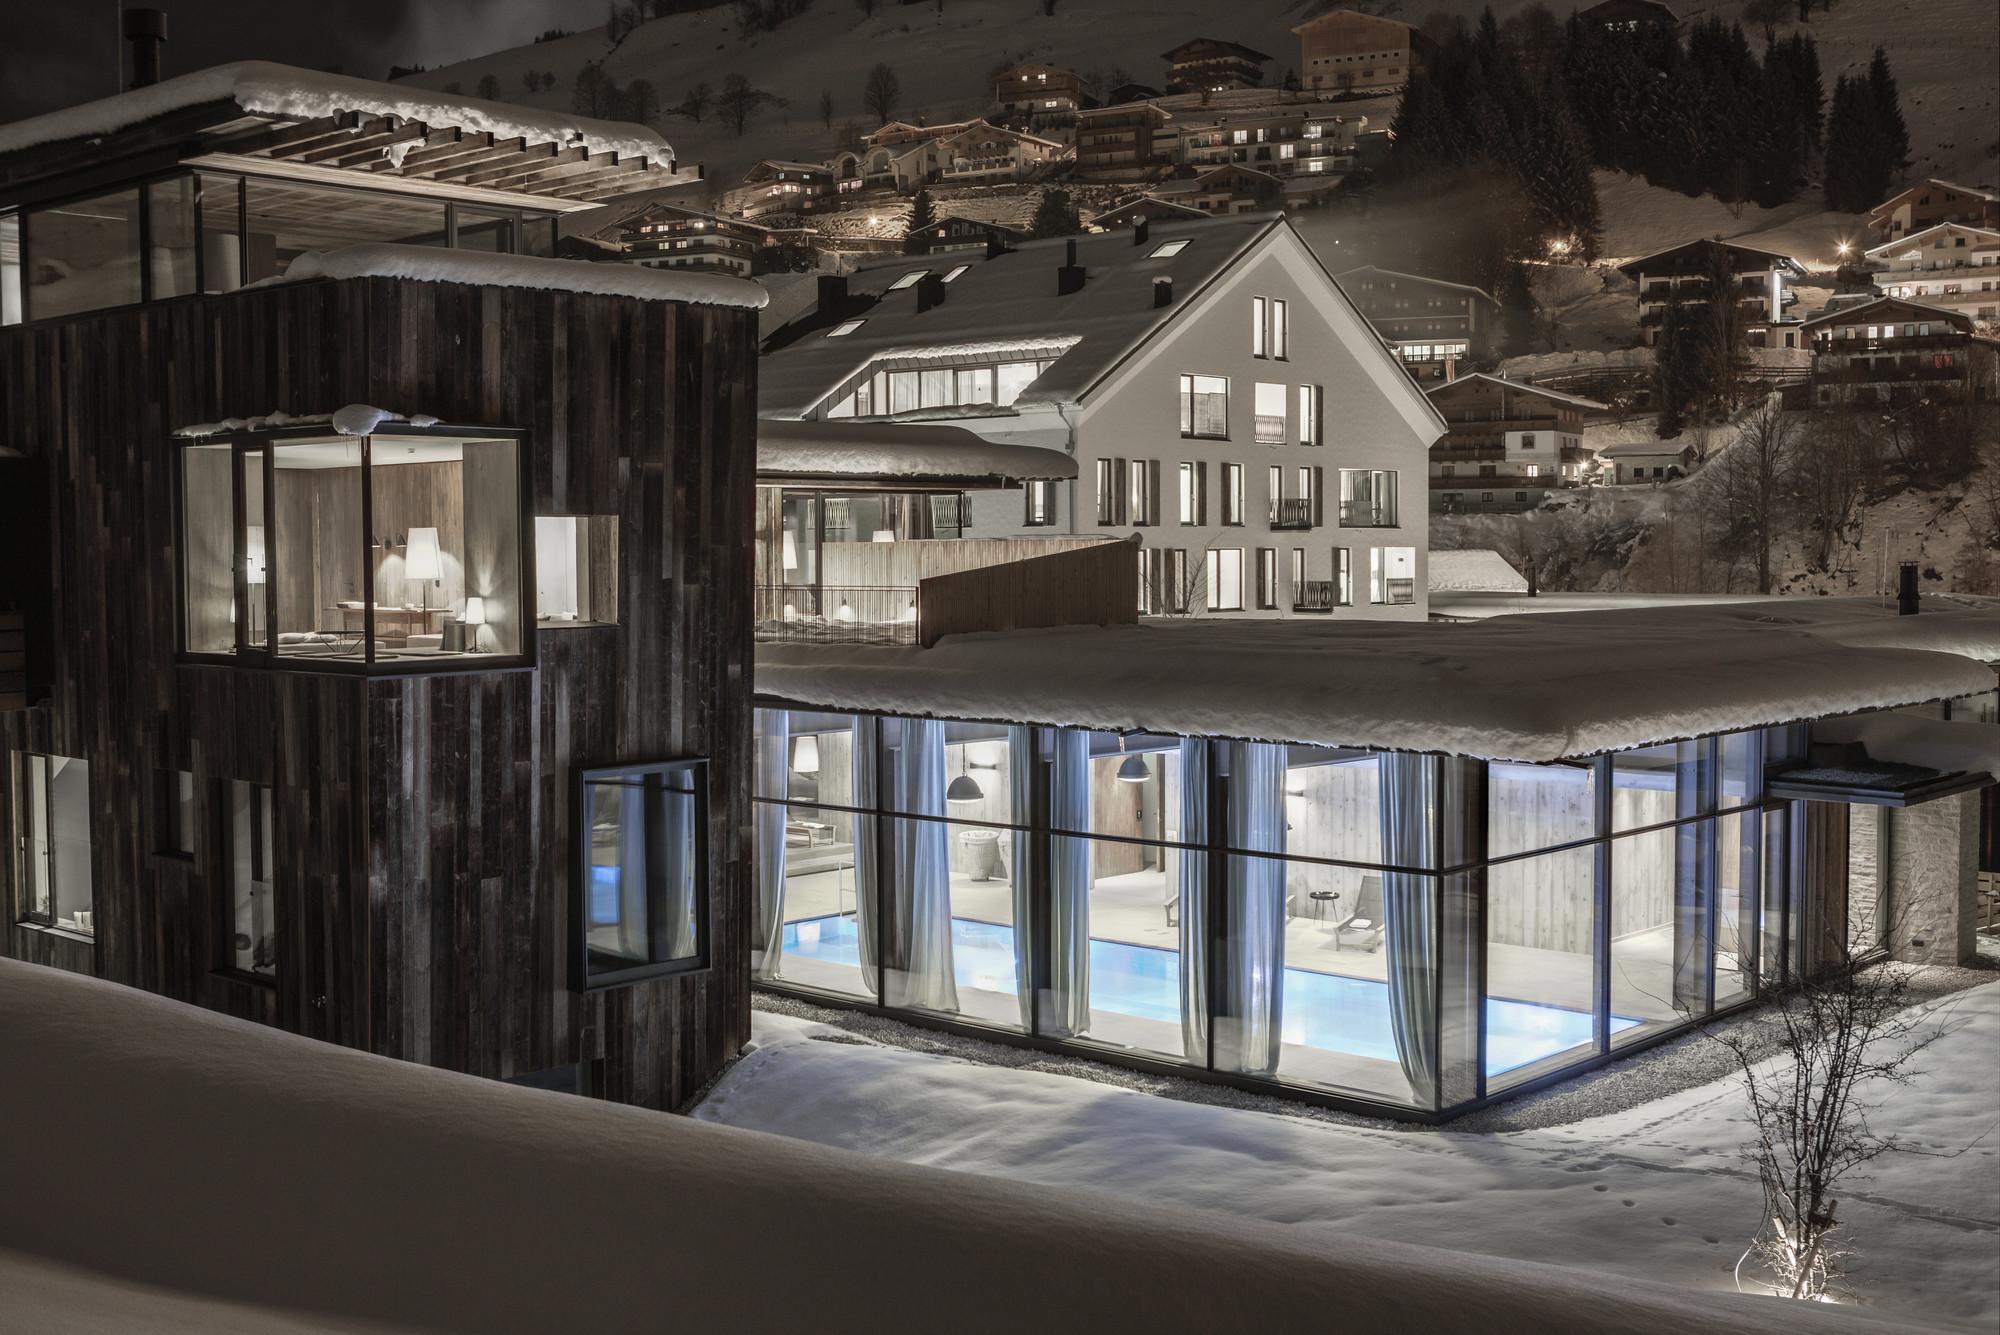 gallery of hotel wiesergut gogl architekten 1. Black Bedroom Furniture Sets. Home Design Ideas